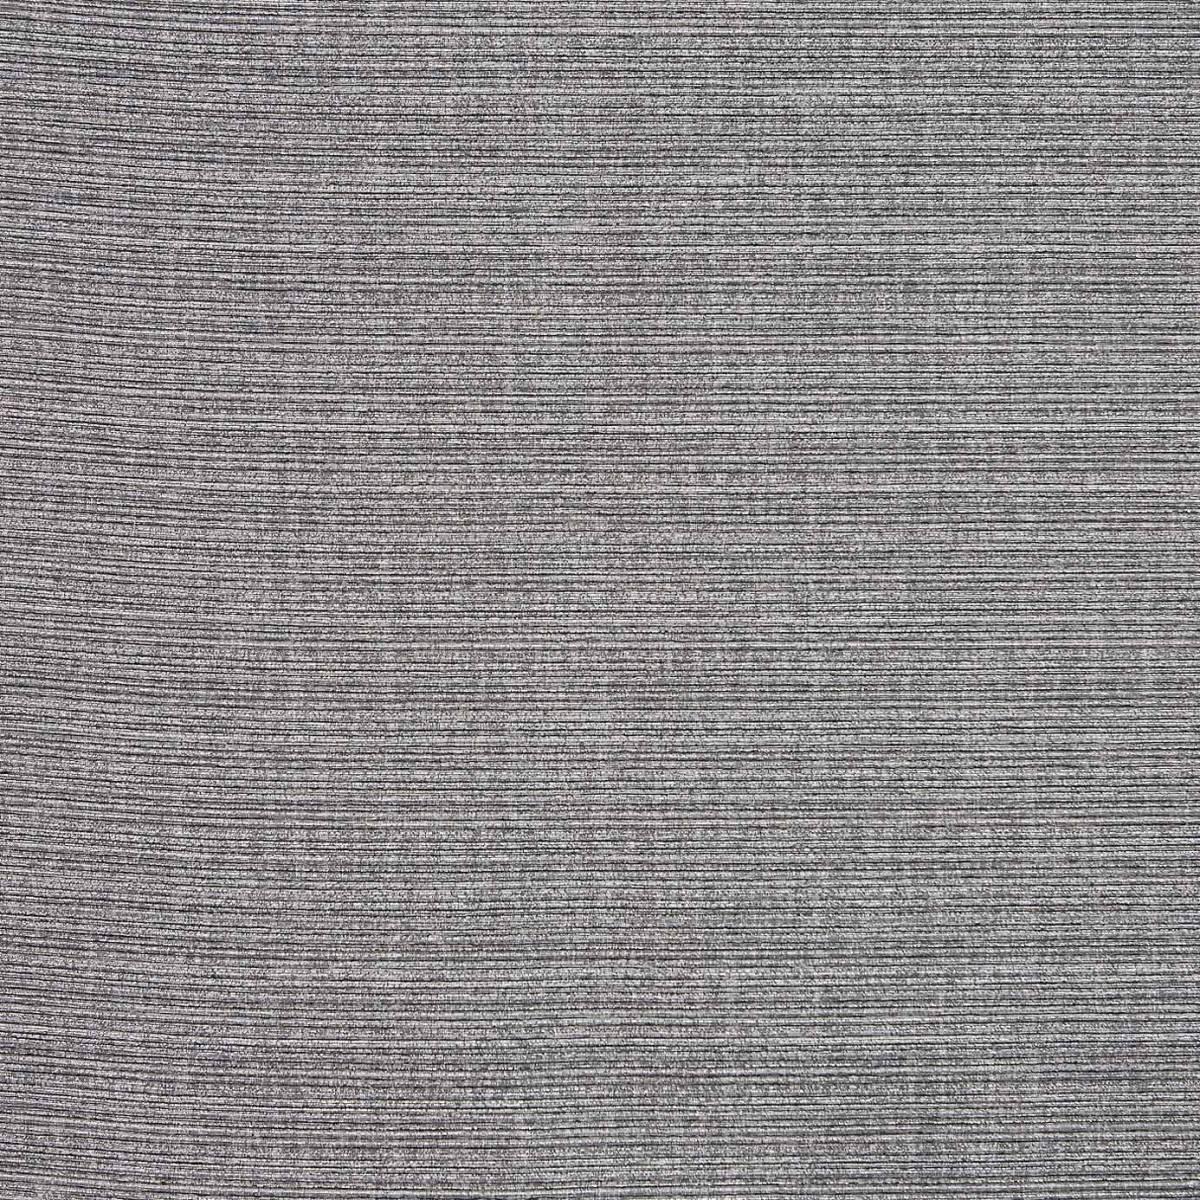 Elixir Fabric Gunmetal 7159 904 Prestigious Textiles